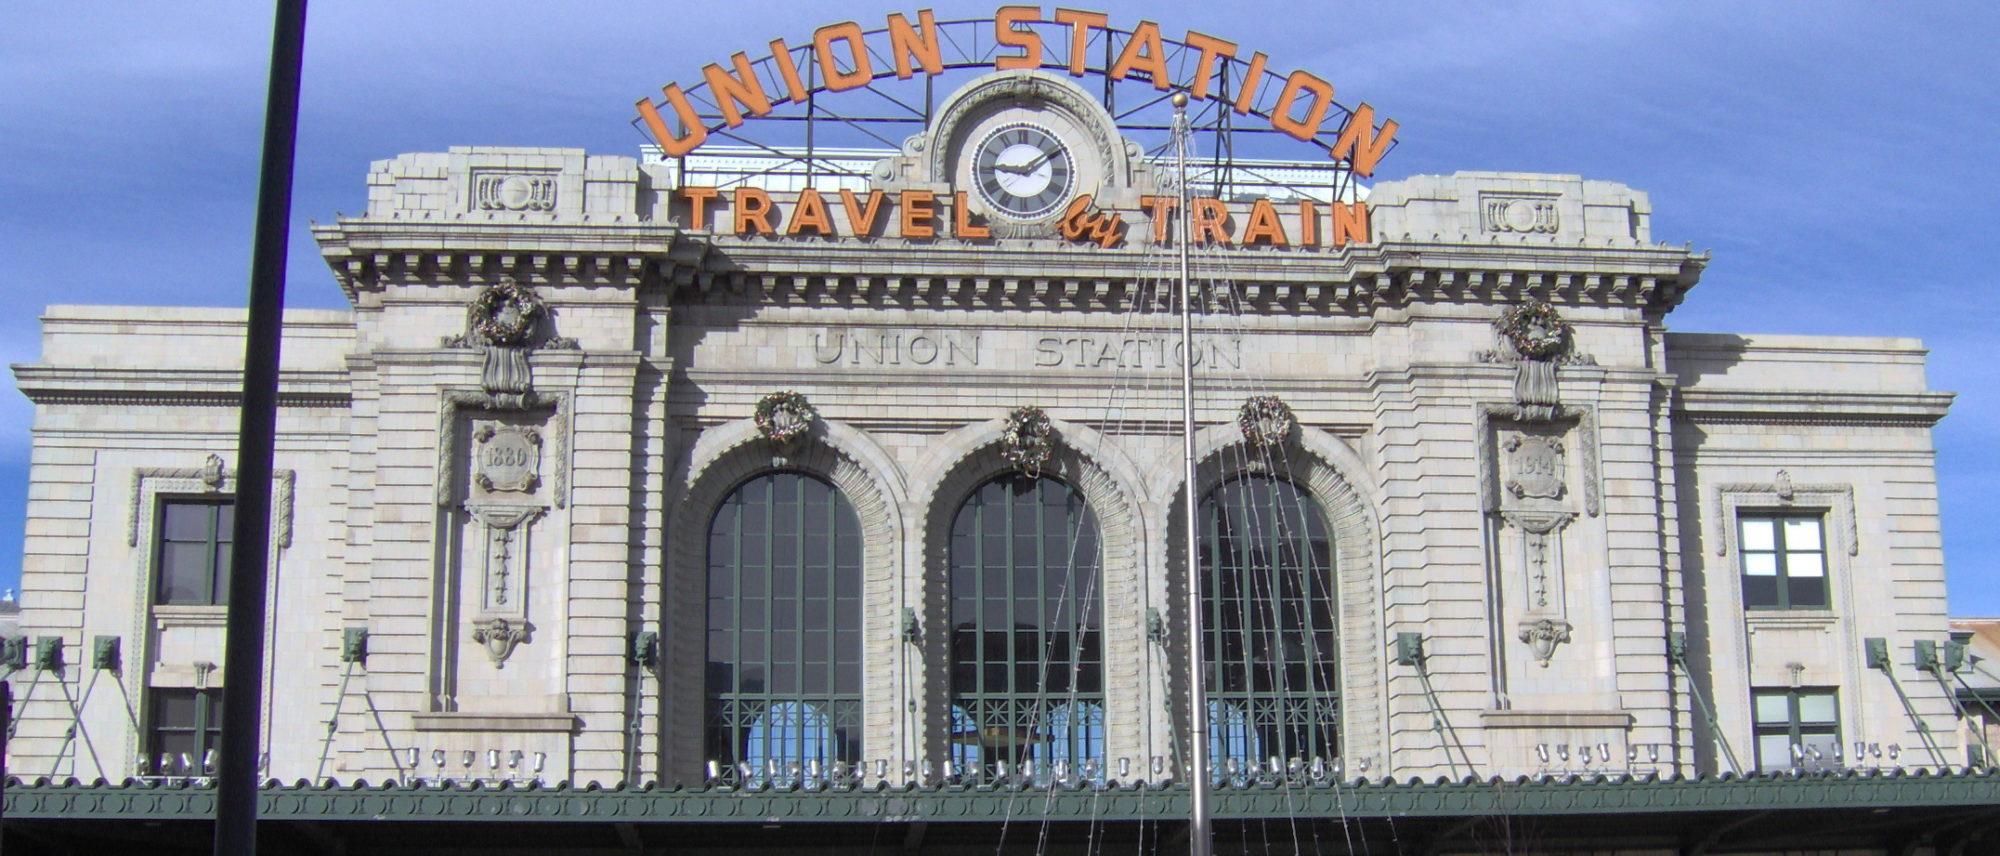 Denver Union Station photo | Vita real estate news blog